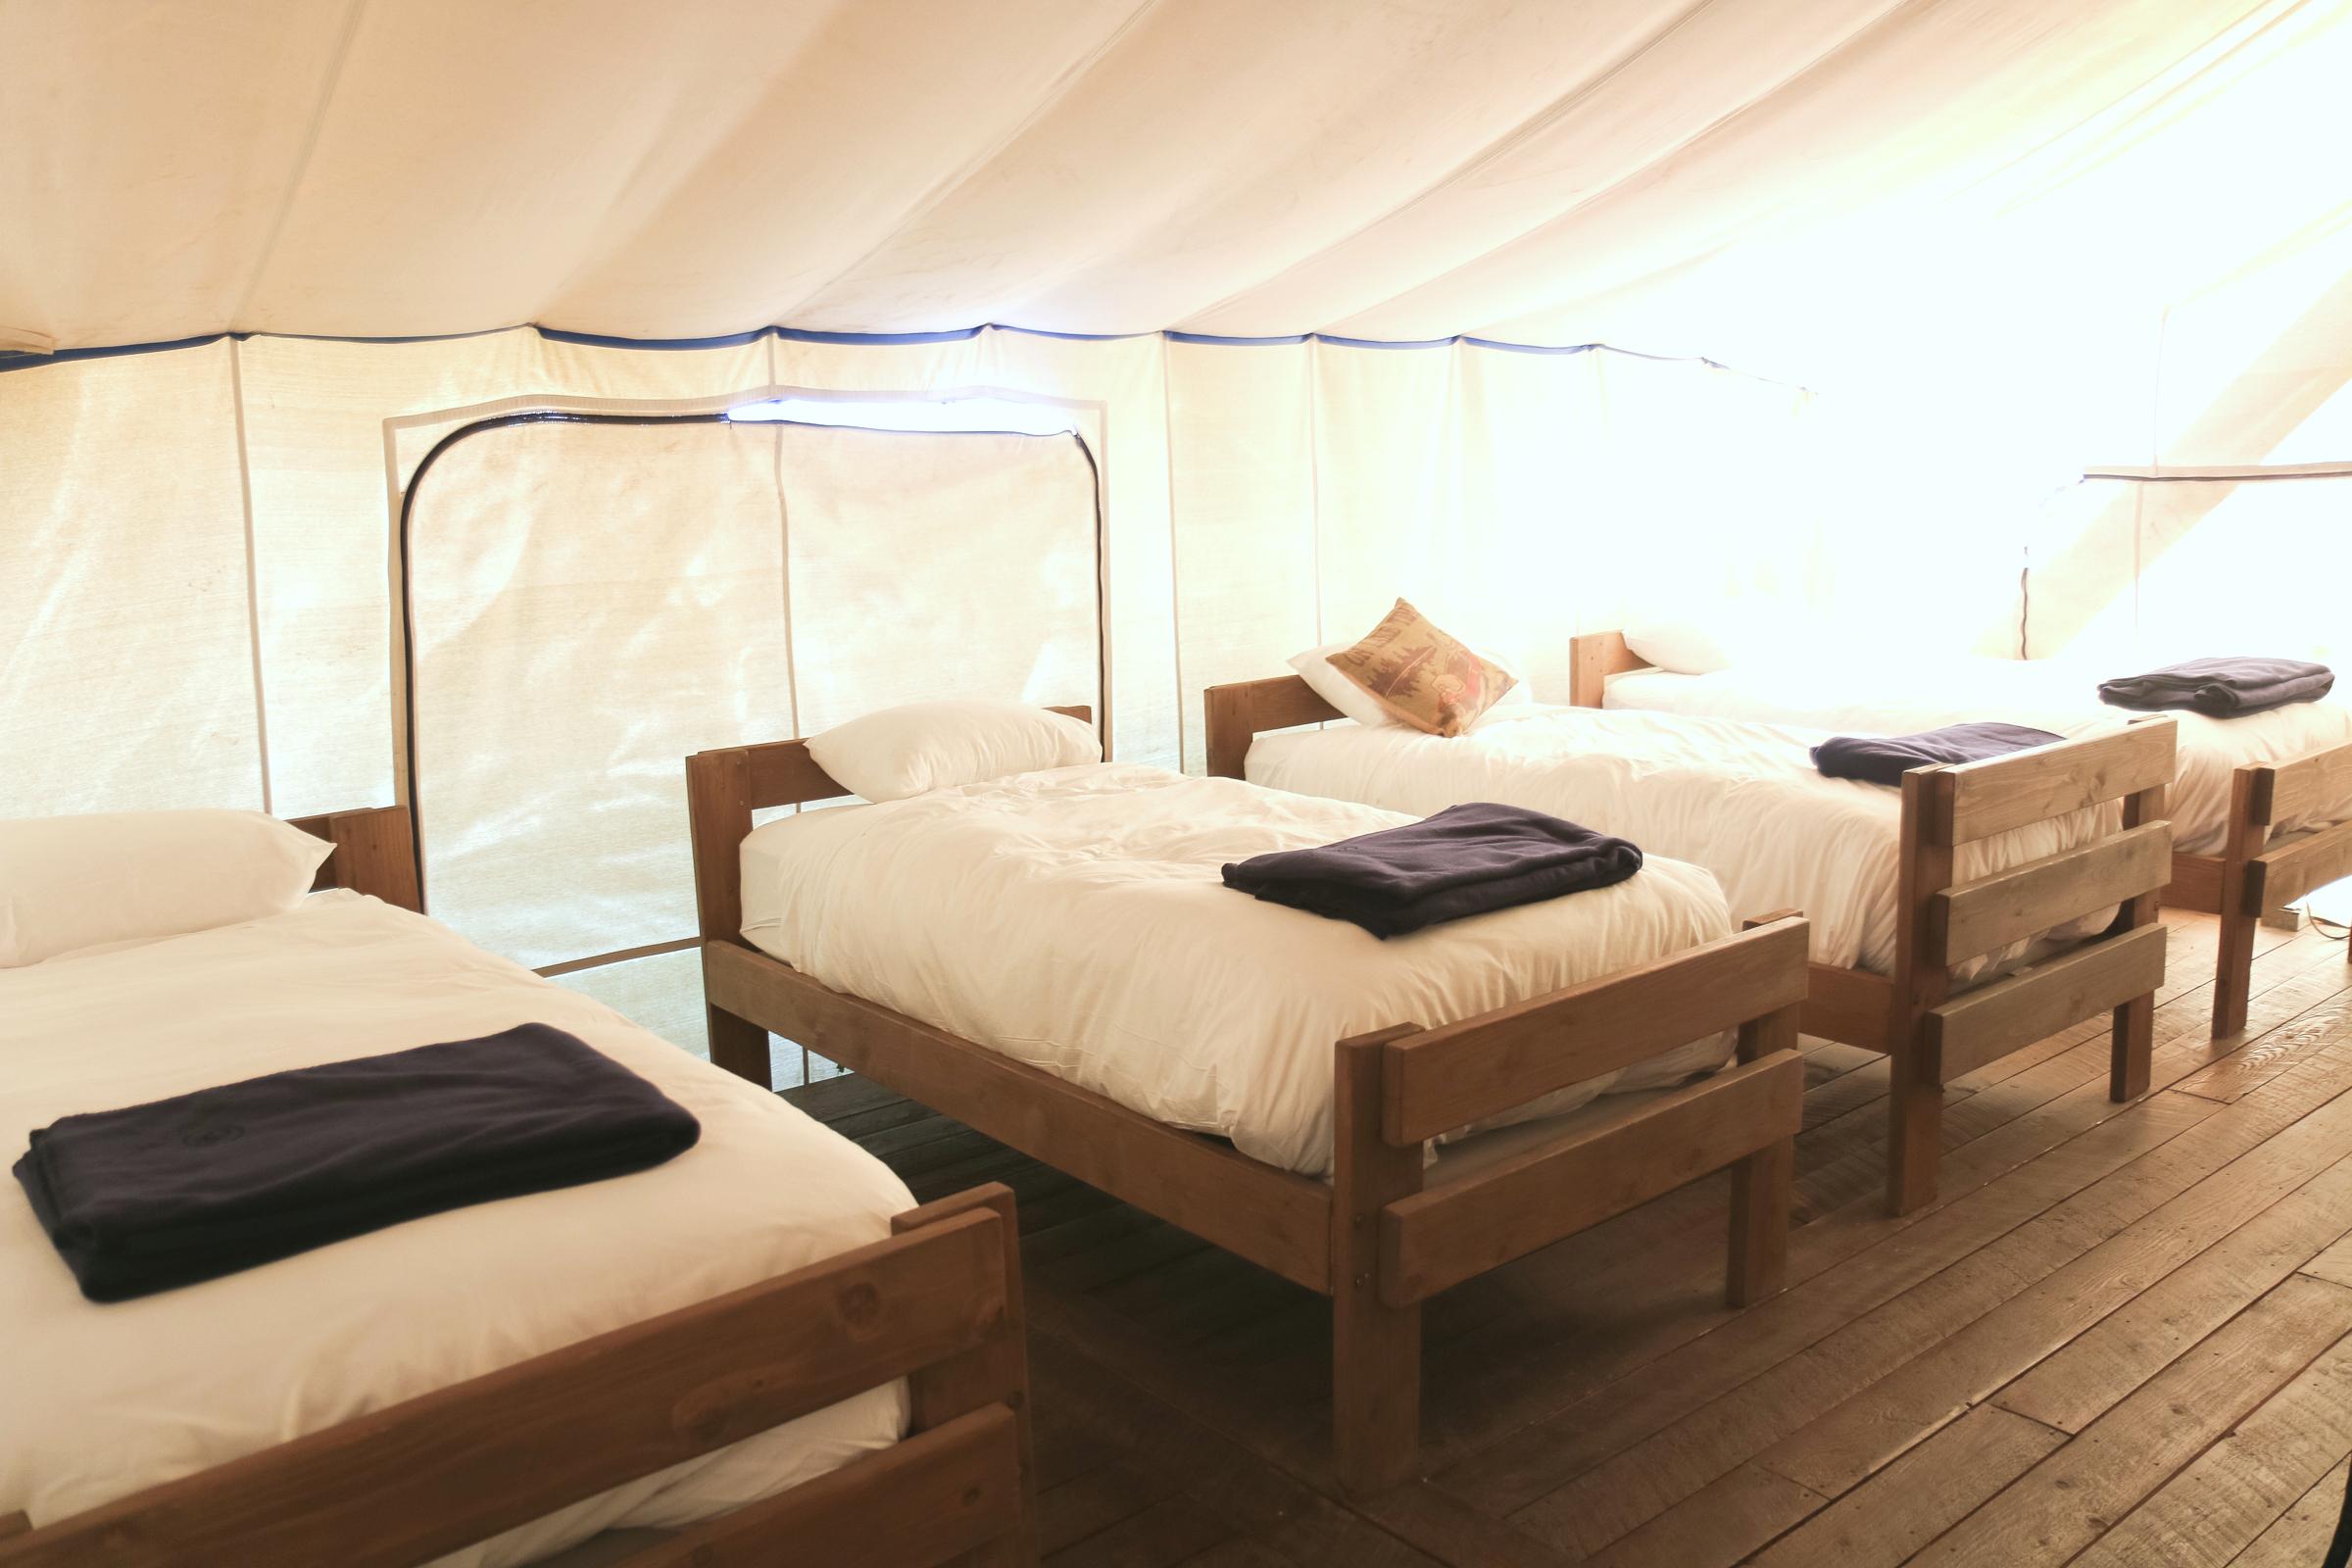 Inside the Grand Tent at Conestoga Ranch